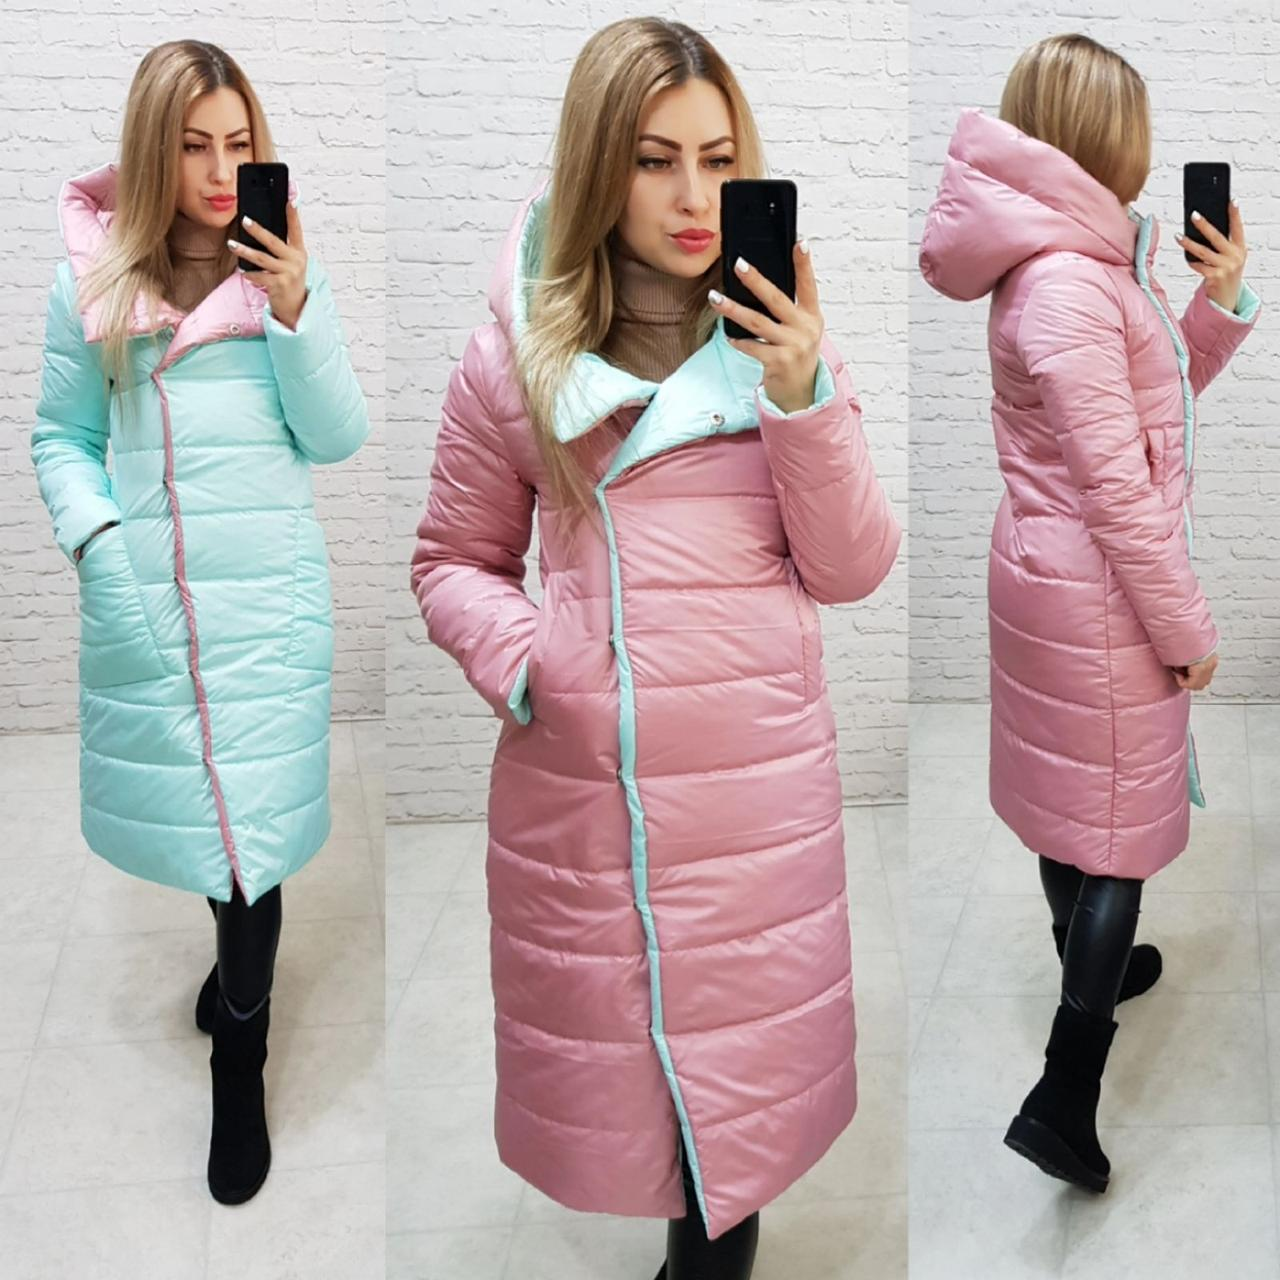 Куртка двустороняя евро-зима  с капюшоном арт. 1007 розовый/мята